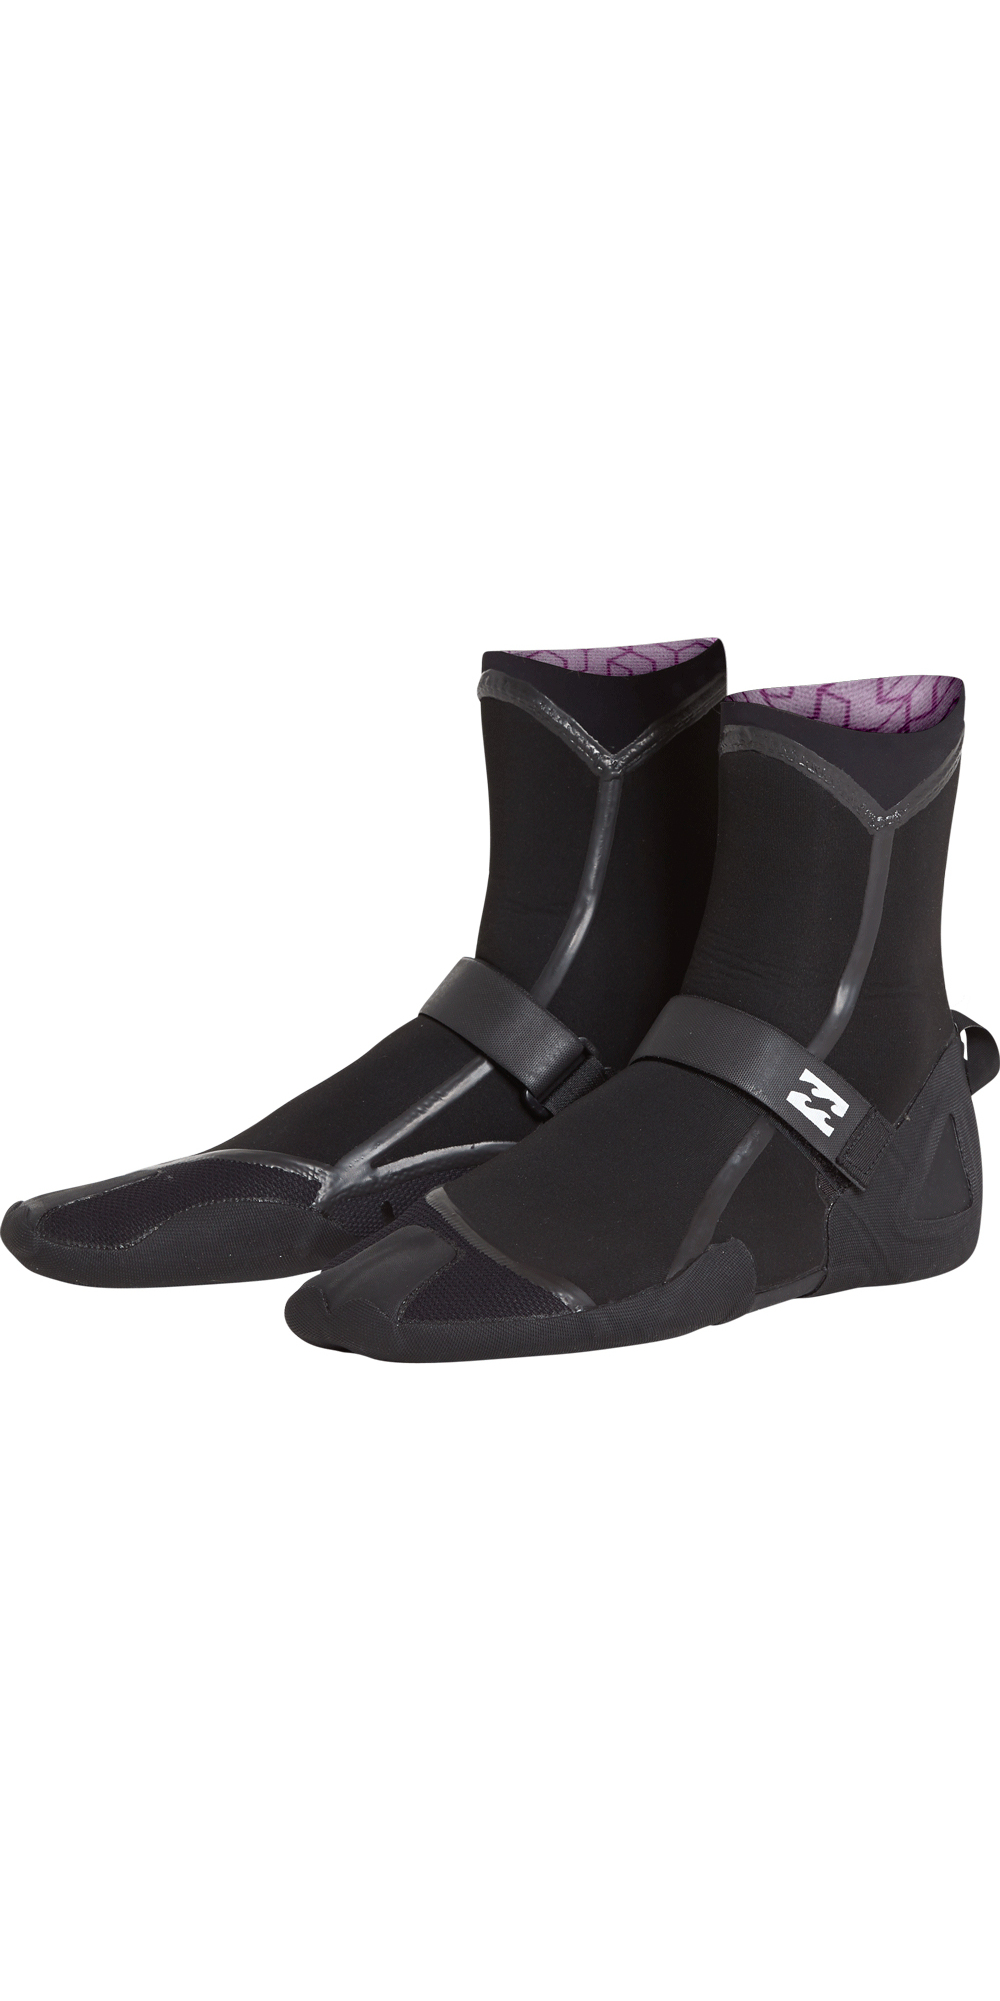 2018 Billabong Furnace Carbon Ultra 7mm Split Toe Boots Black L4BT20